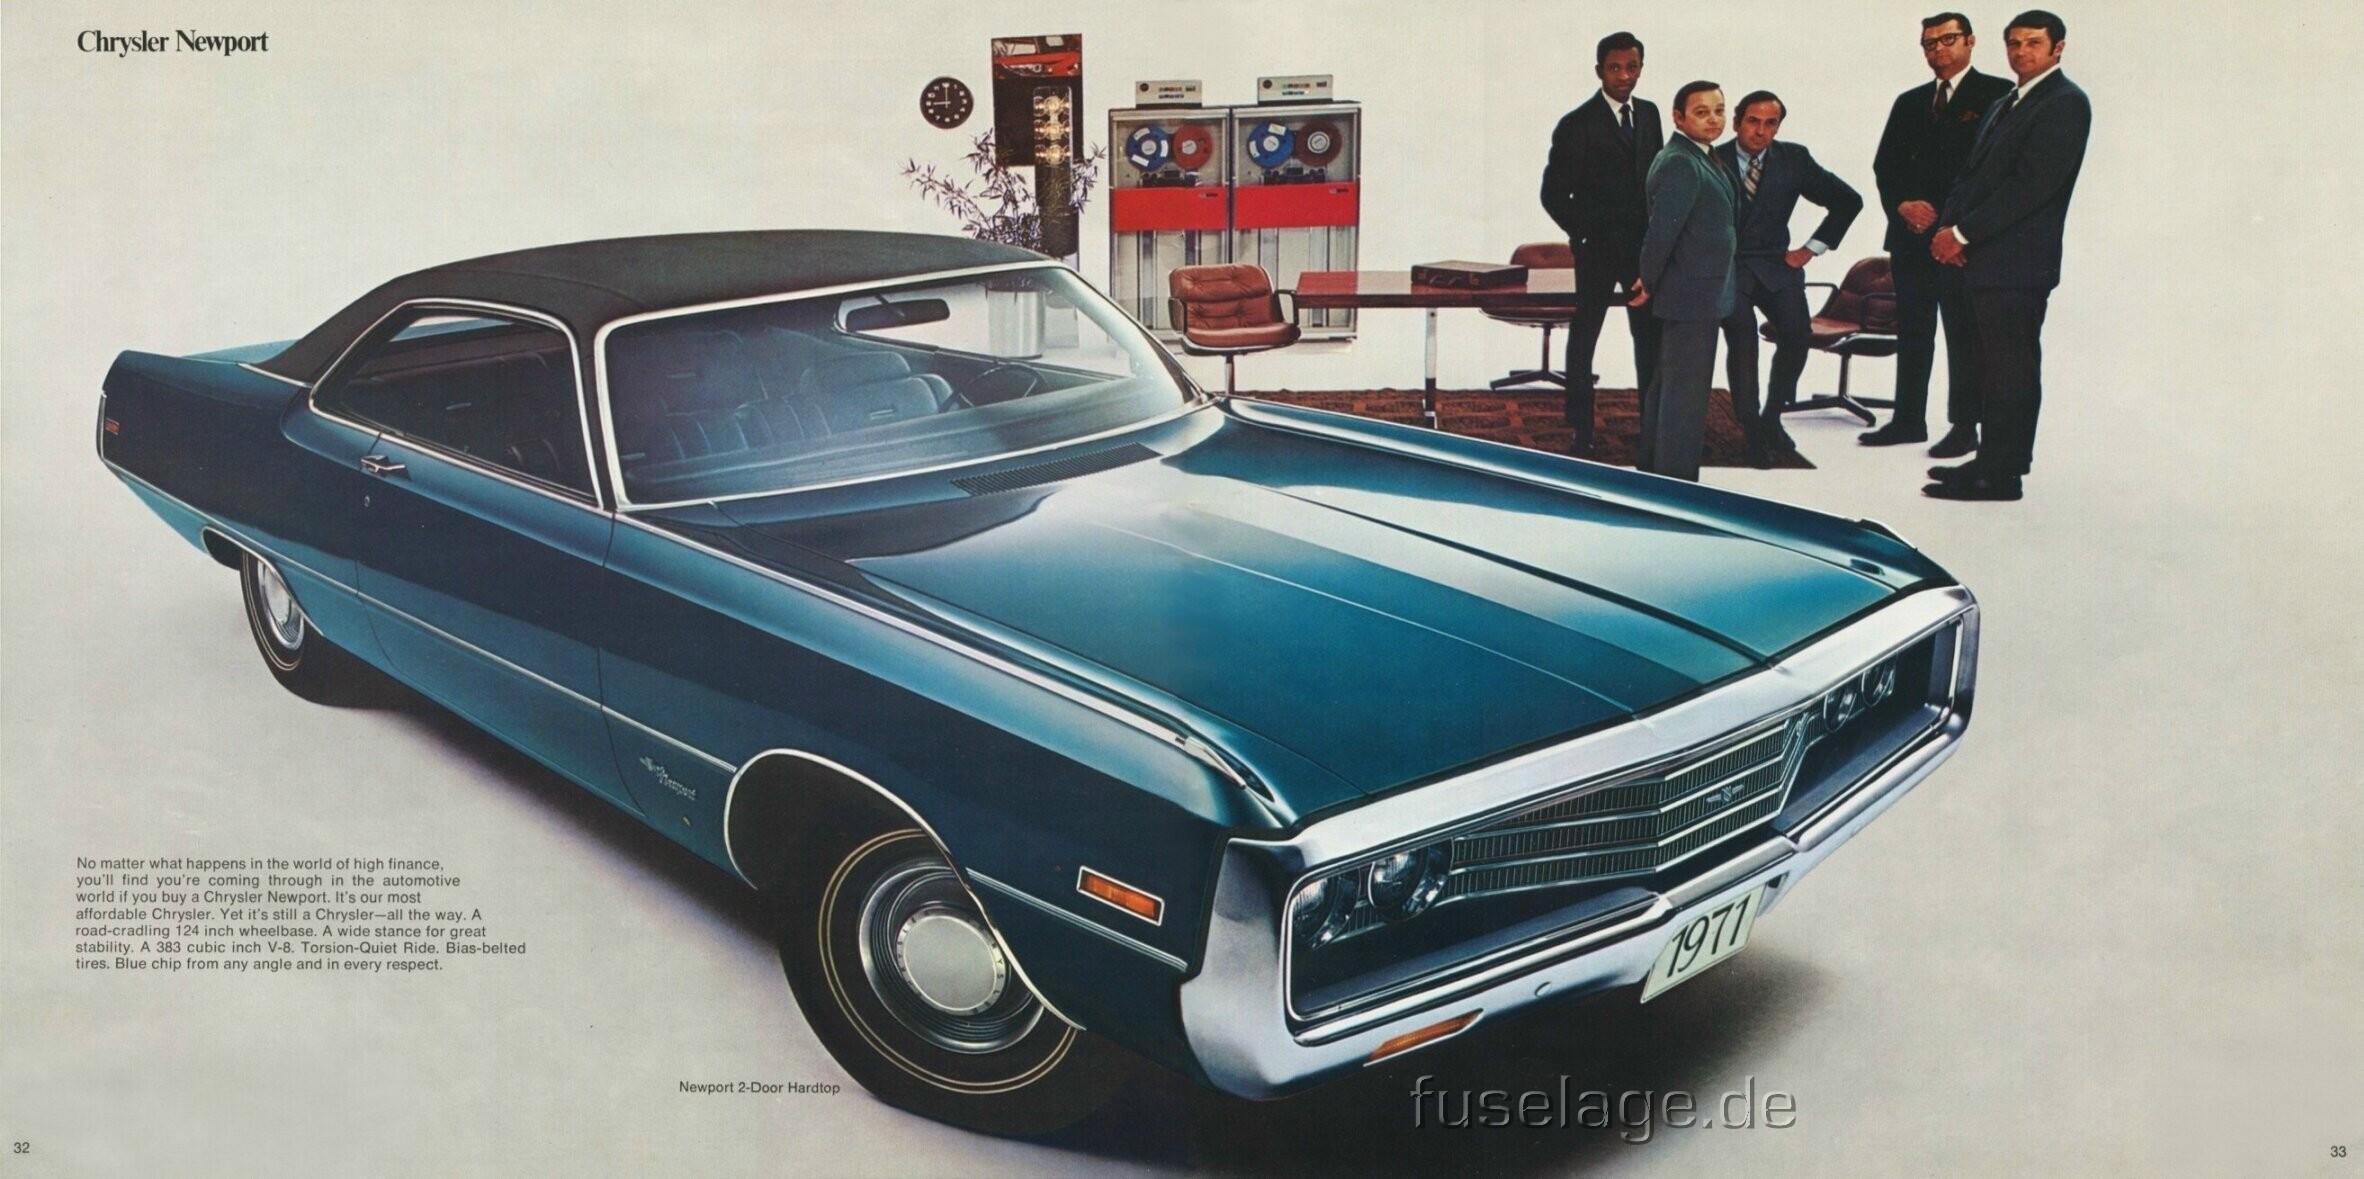 188 best chrysler motors usa images on pinterest newport motors and vintage cars